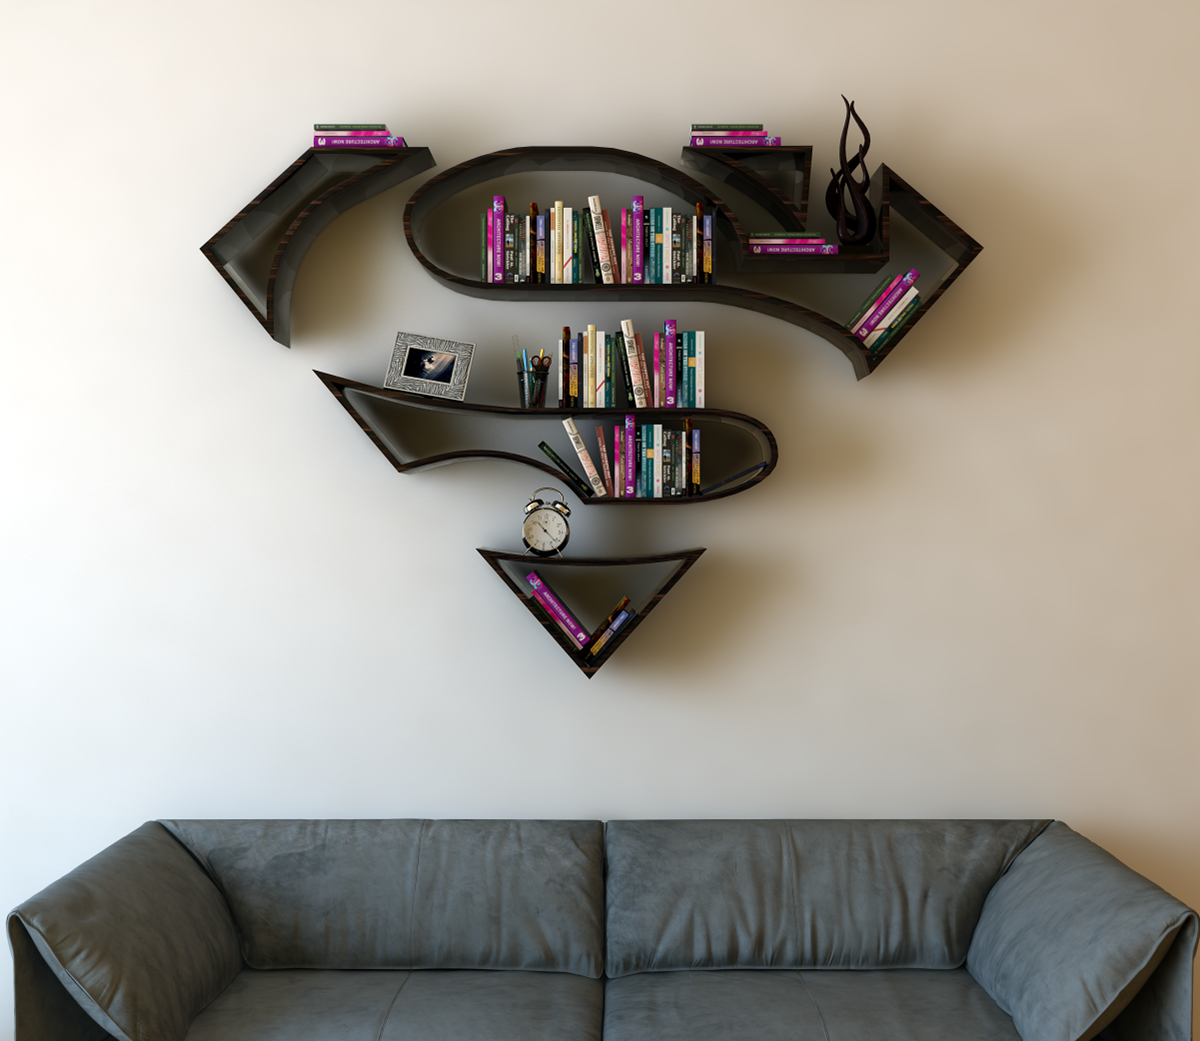 Comic Book Room Ideas: Your Walls Will Love These Superhero 3D Book Shelf Ideas